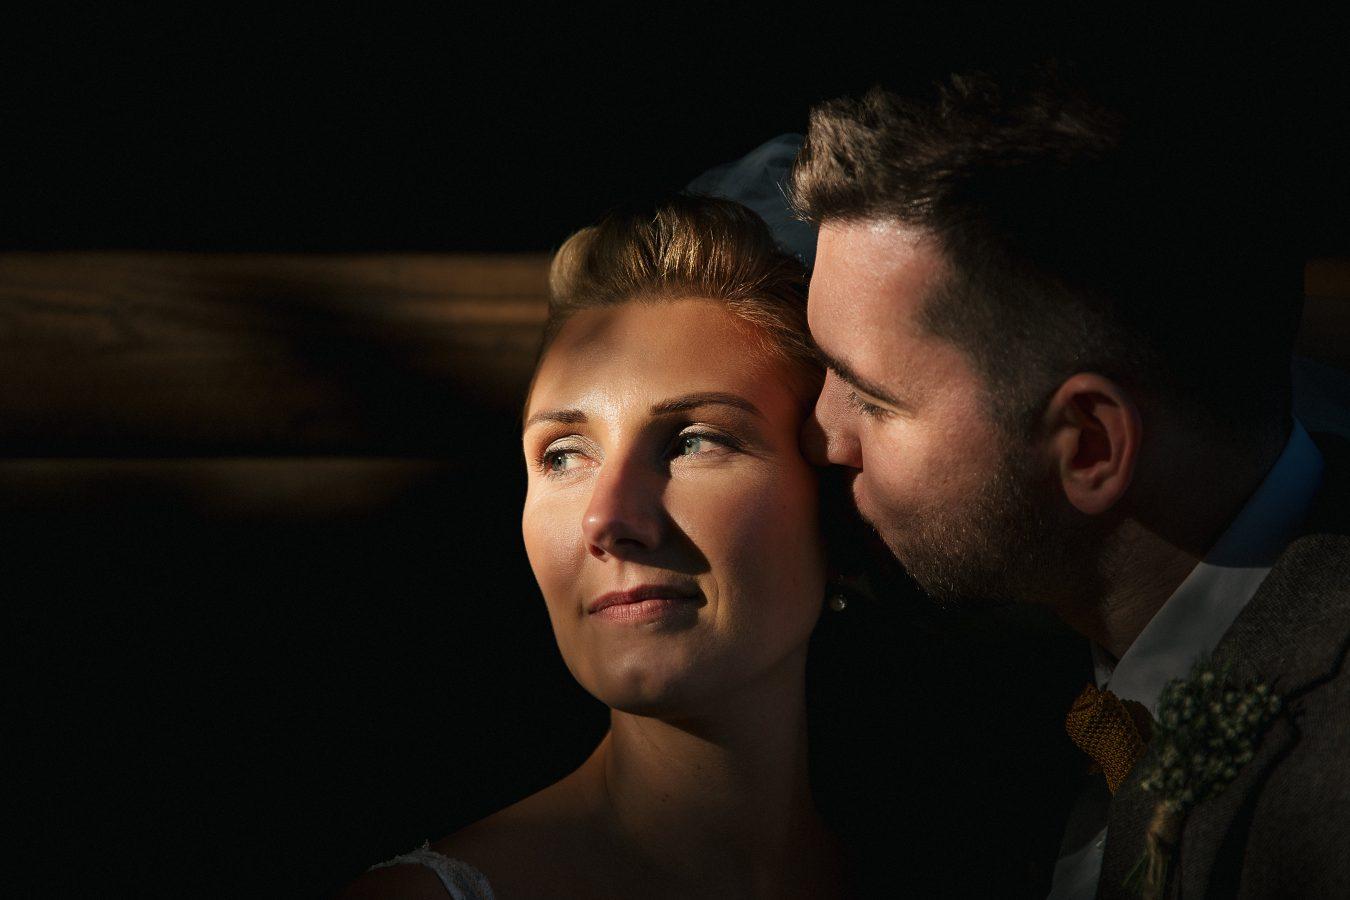 David-Lucy-Jules-Barron-Yorkshire-Wedding-Photography-2018-531